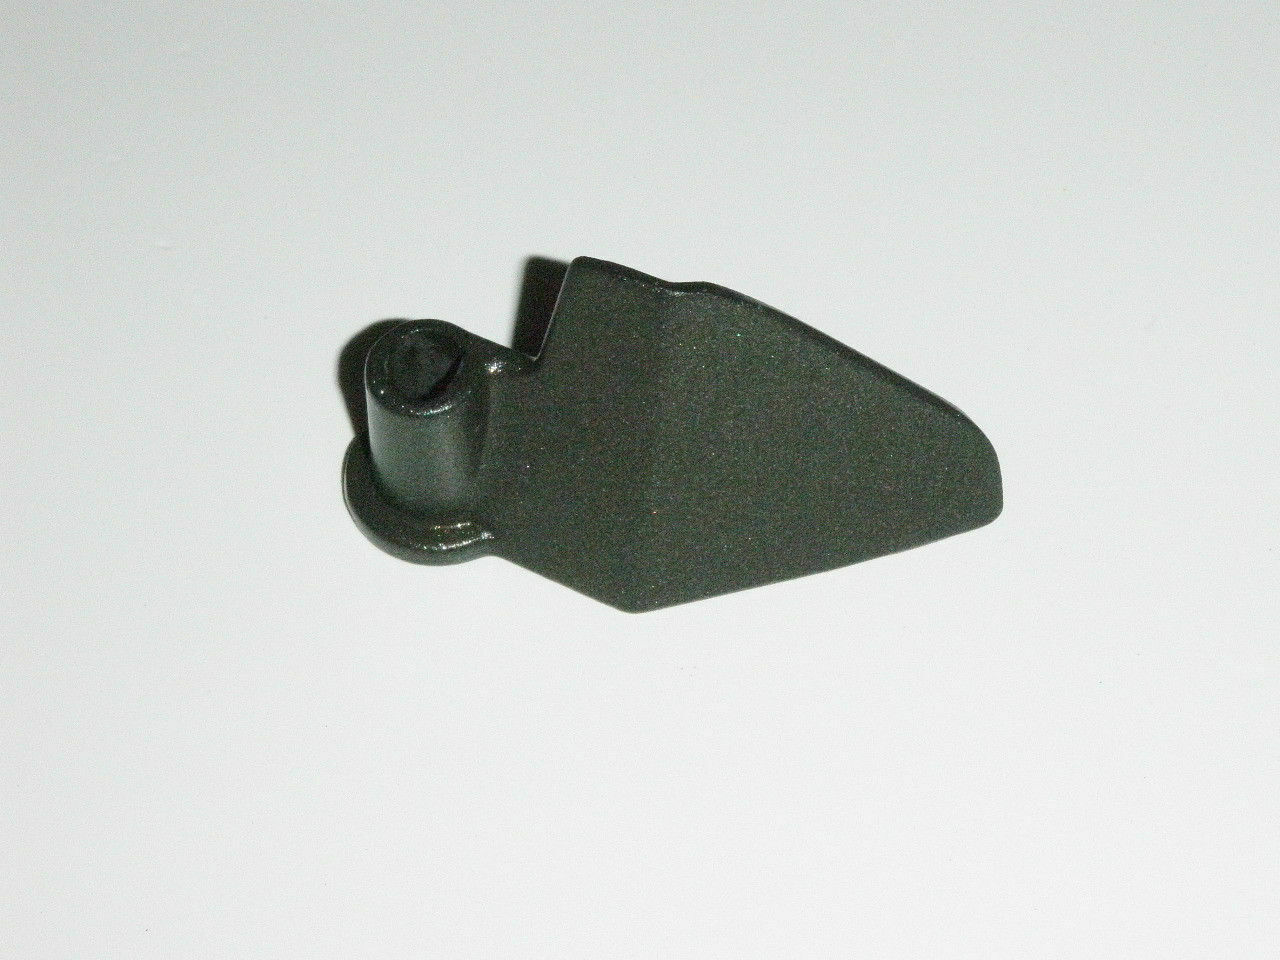 Paddle for GE Bread Maker Machine Model 106861 (S16) - $16.82